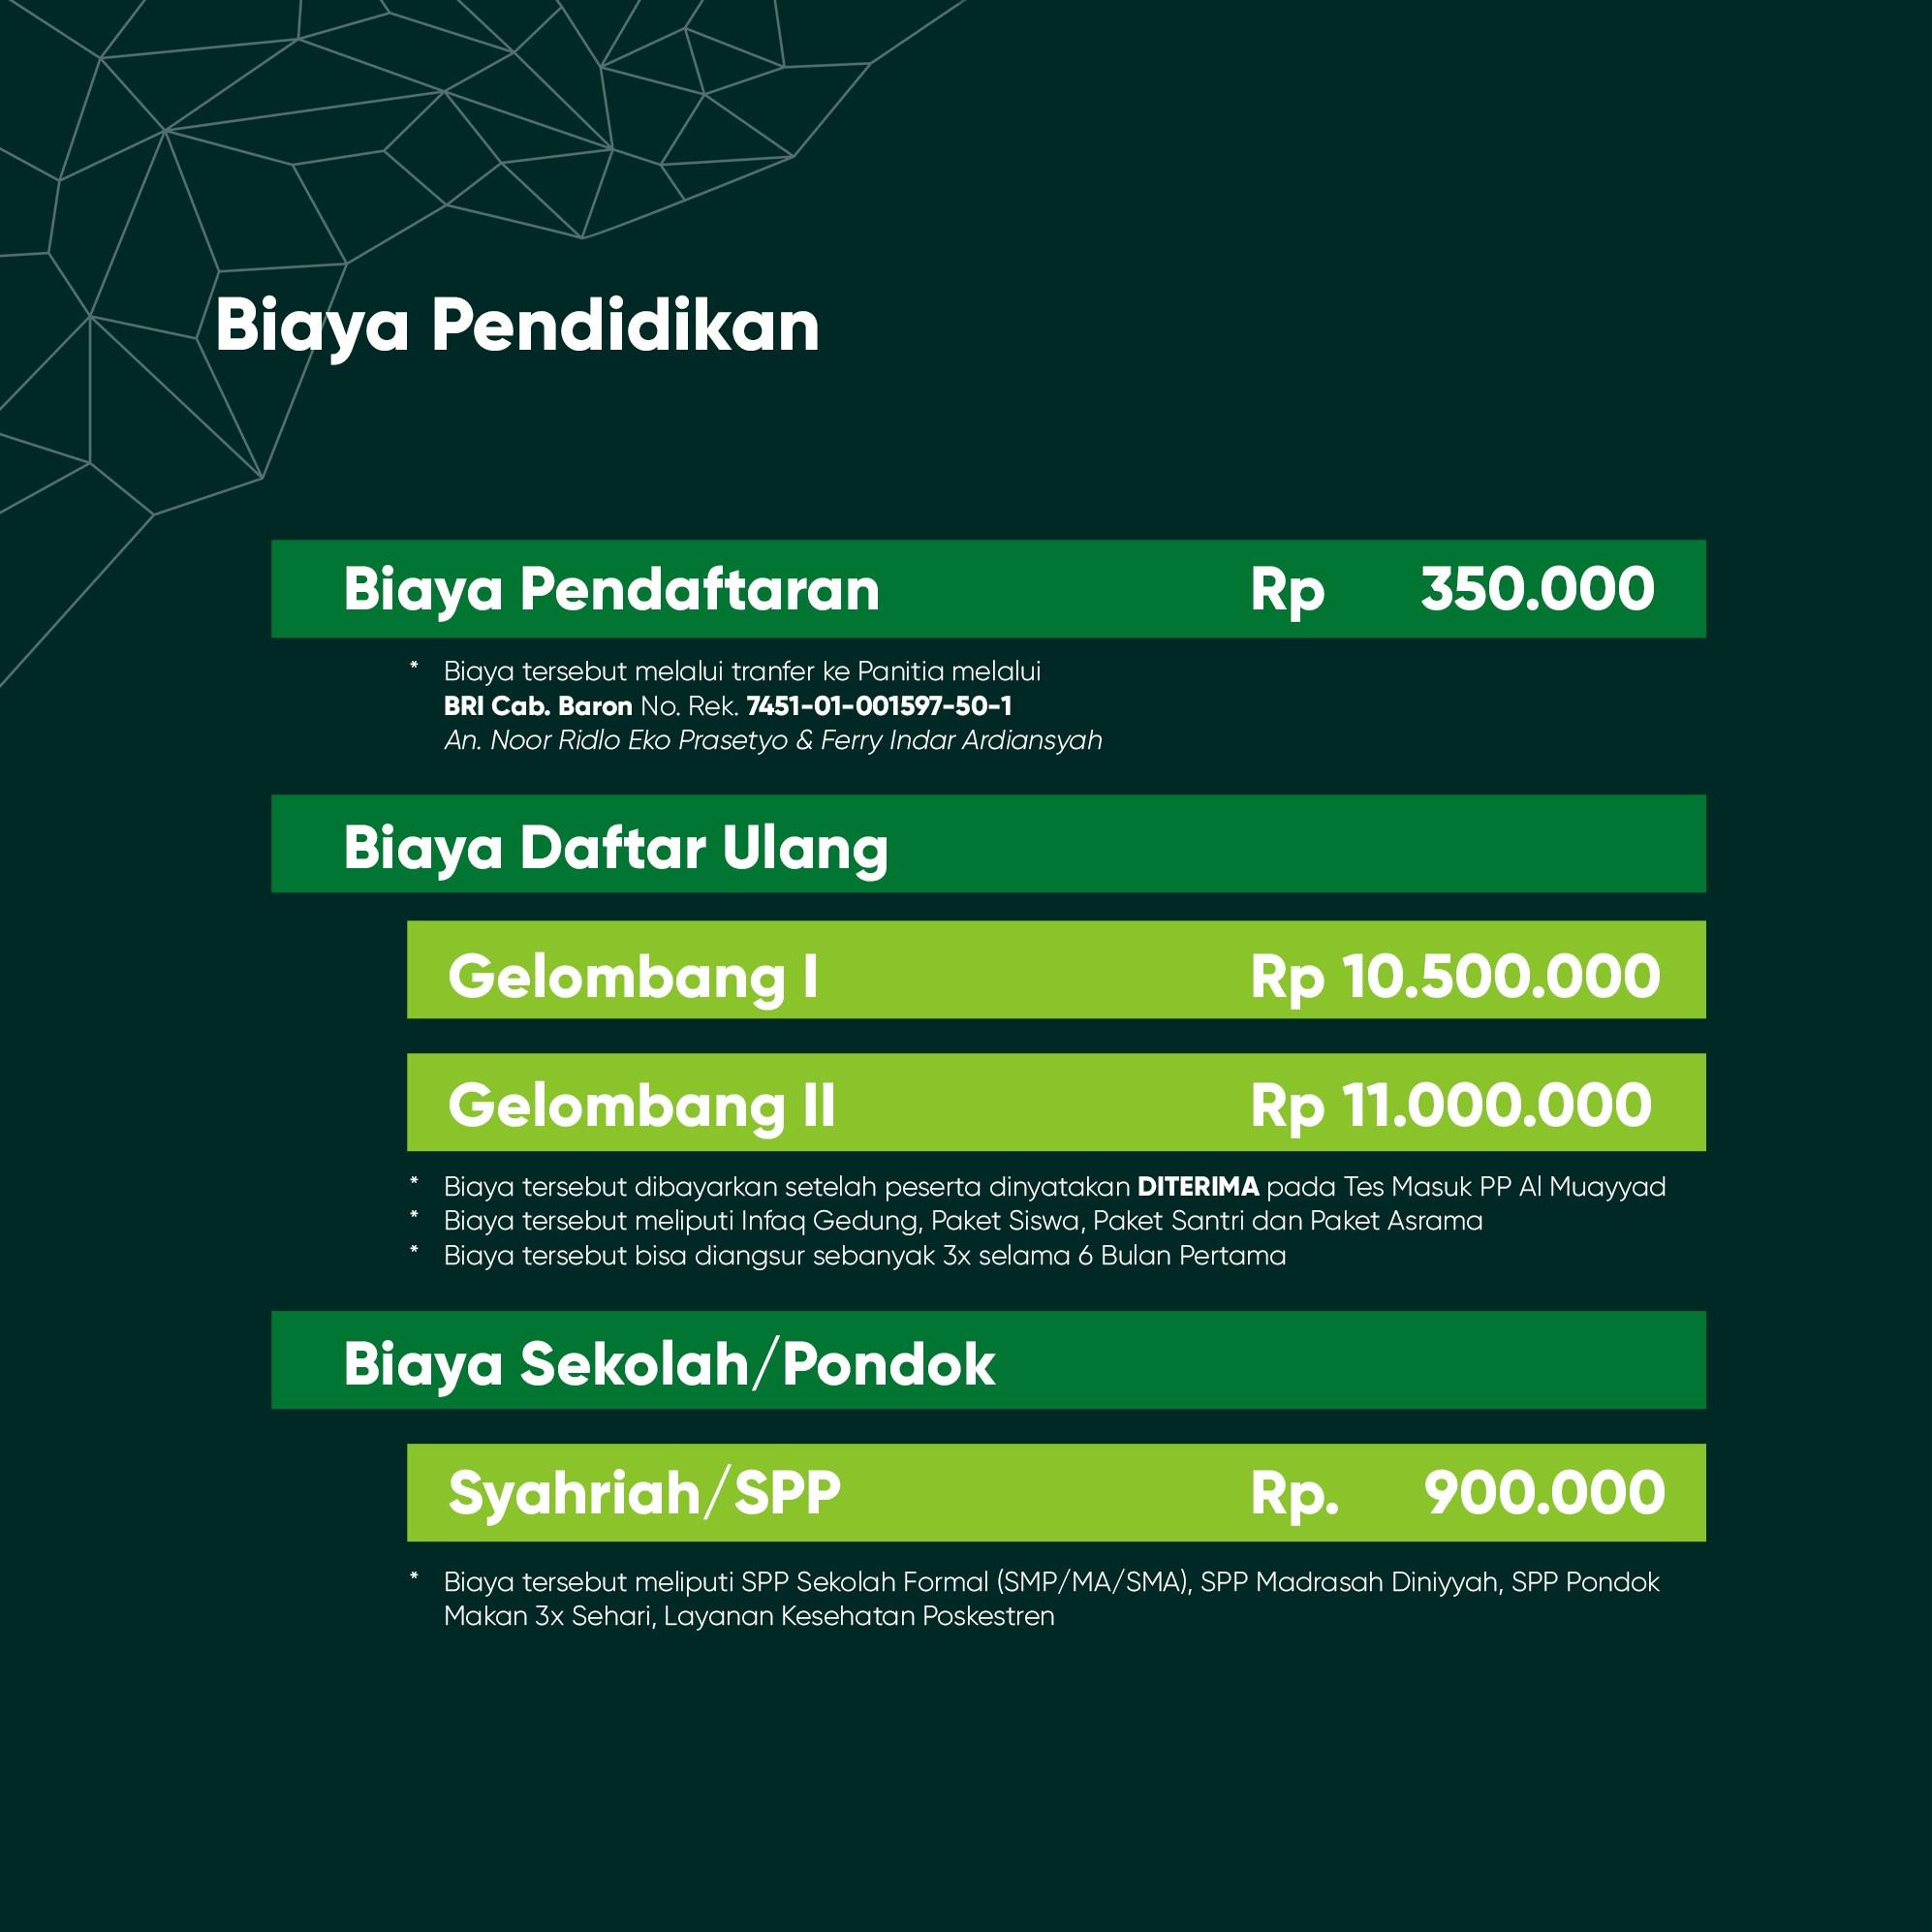 Biaya Pendaftaran Al-Muayyad